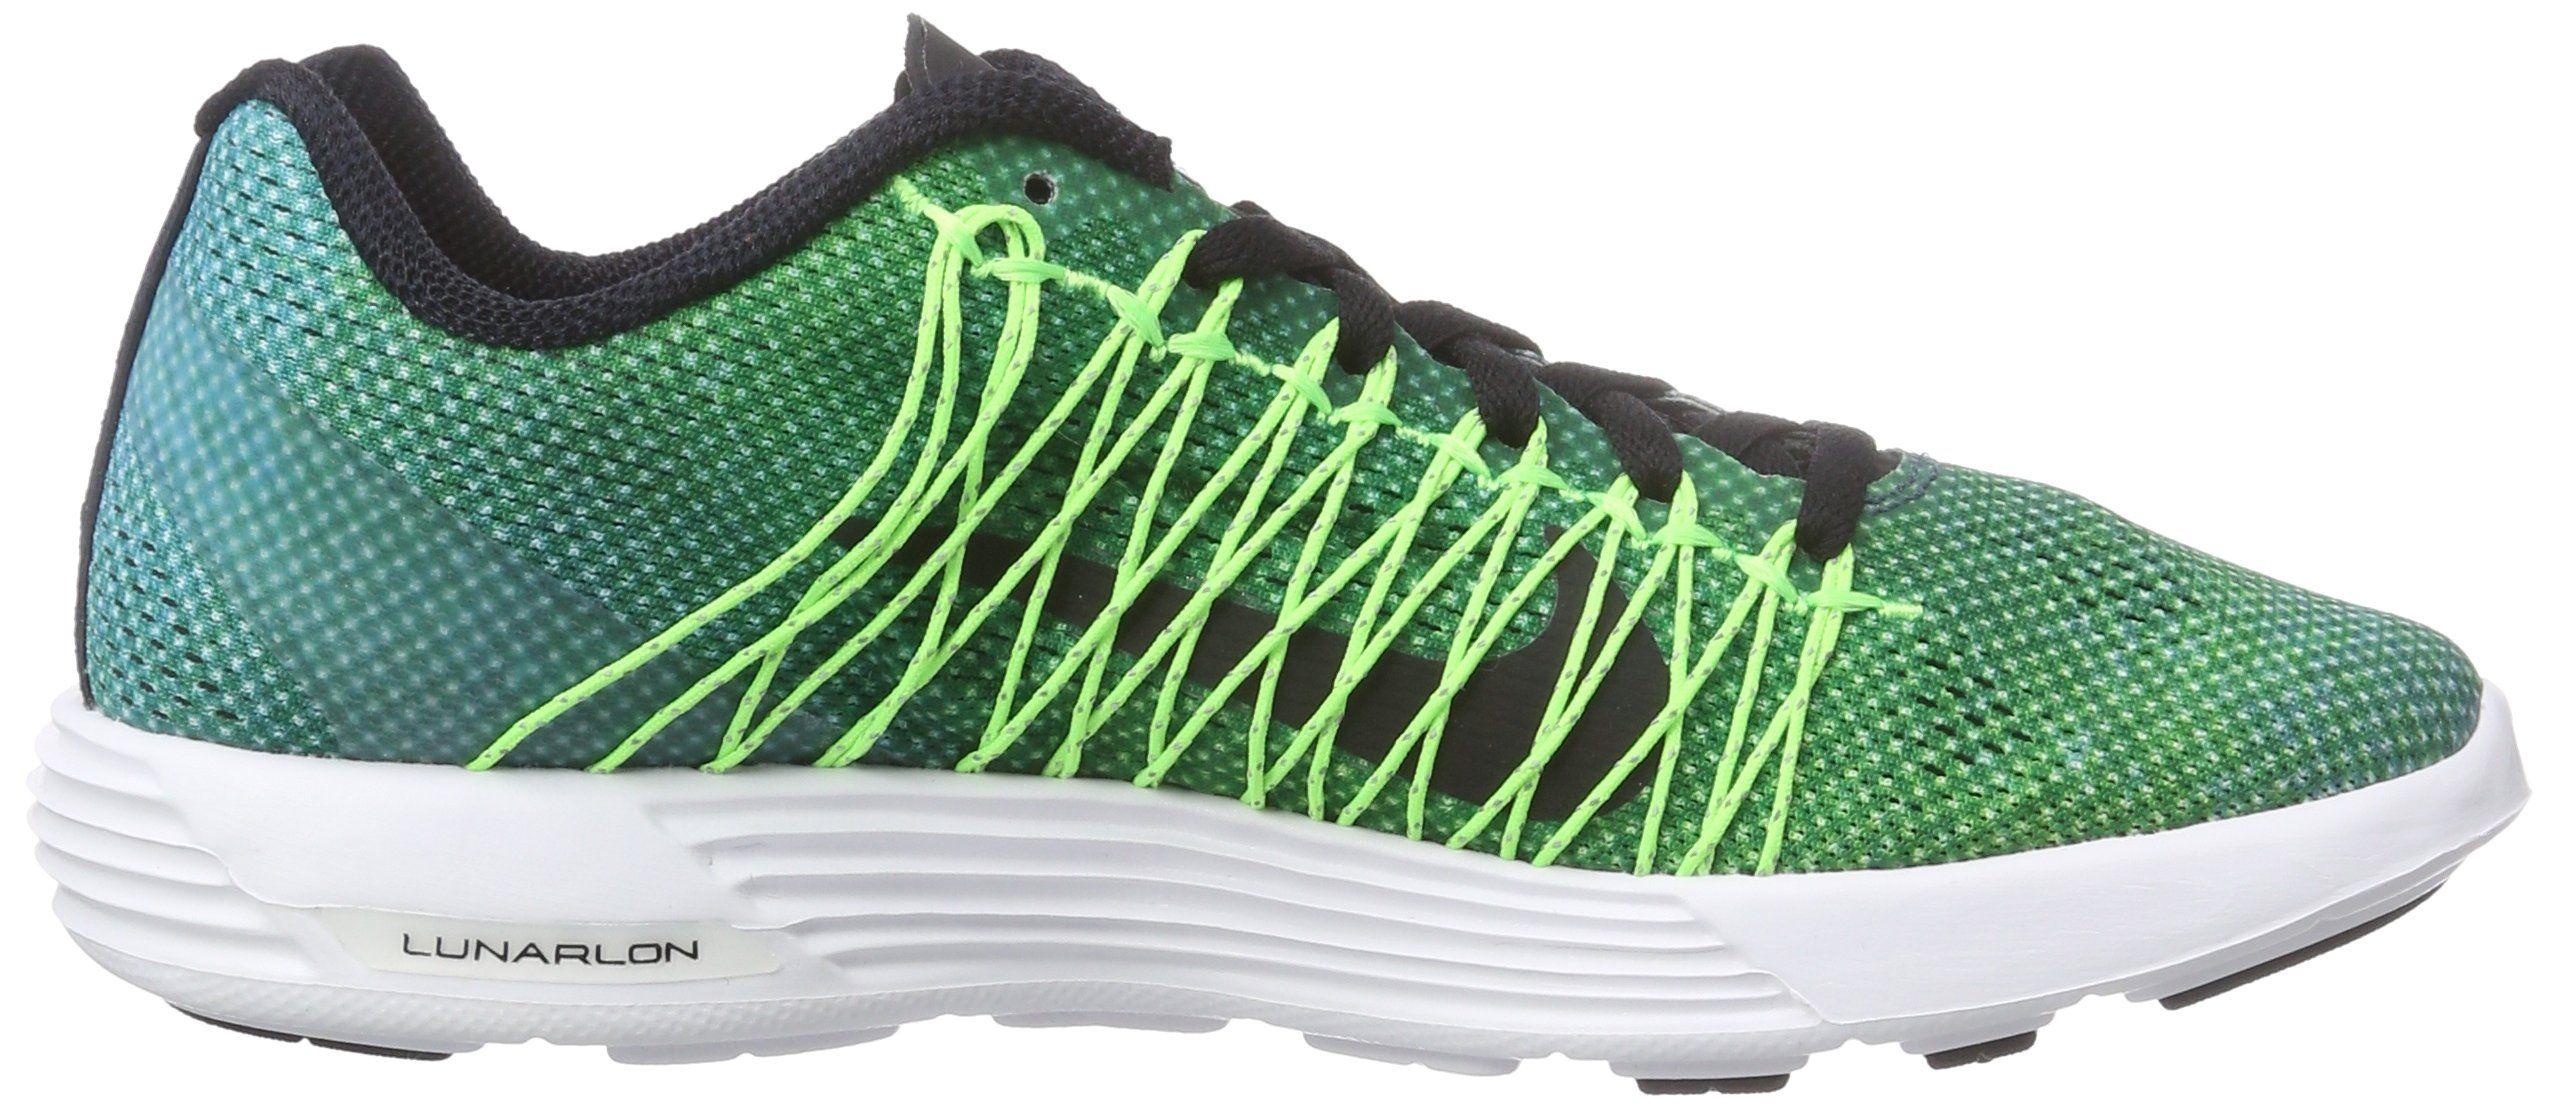 785df2ebd8ef NIKE Lunaracer 3 Womens Running Trainers 554683 Sneakers Shoes US 6 Light  Aqua Black Flash Lime